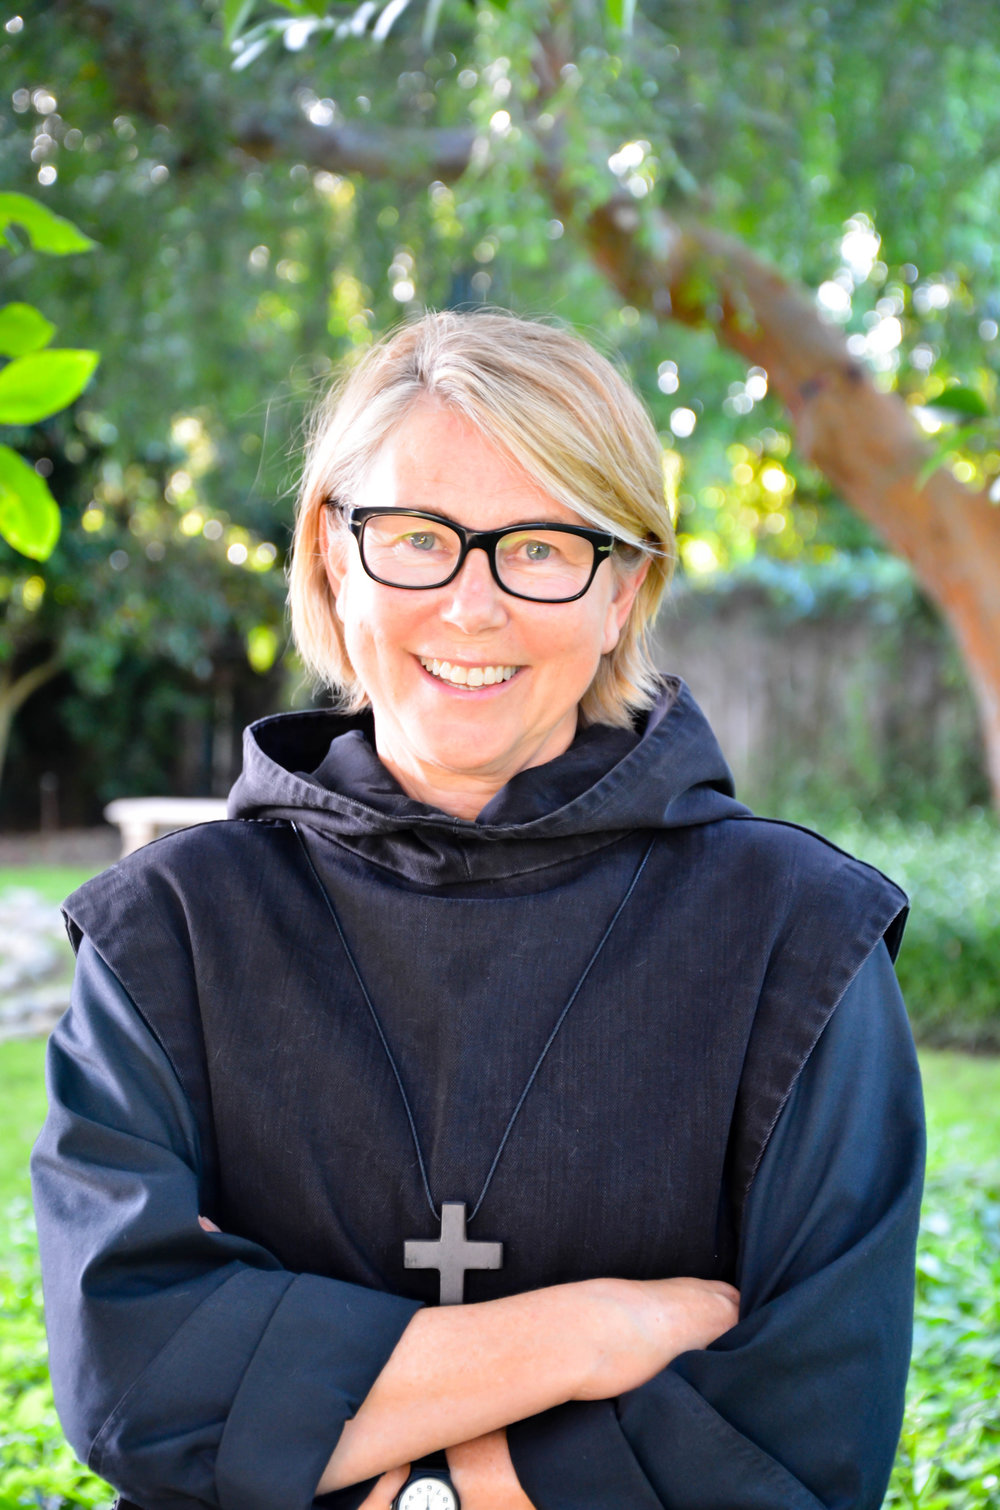 Sr. Greta Ronnigen, CDL